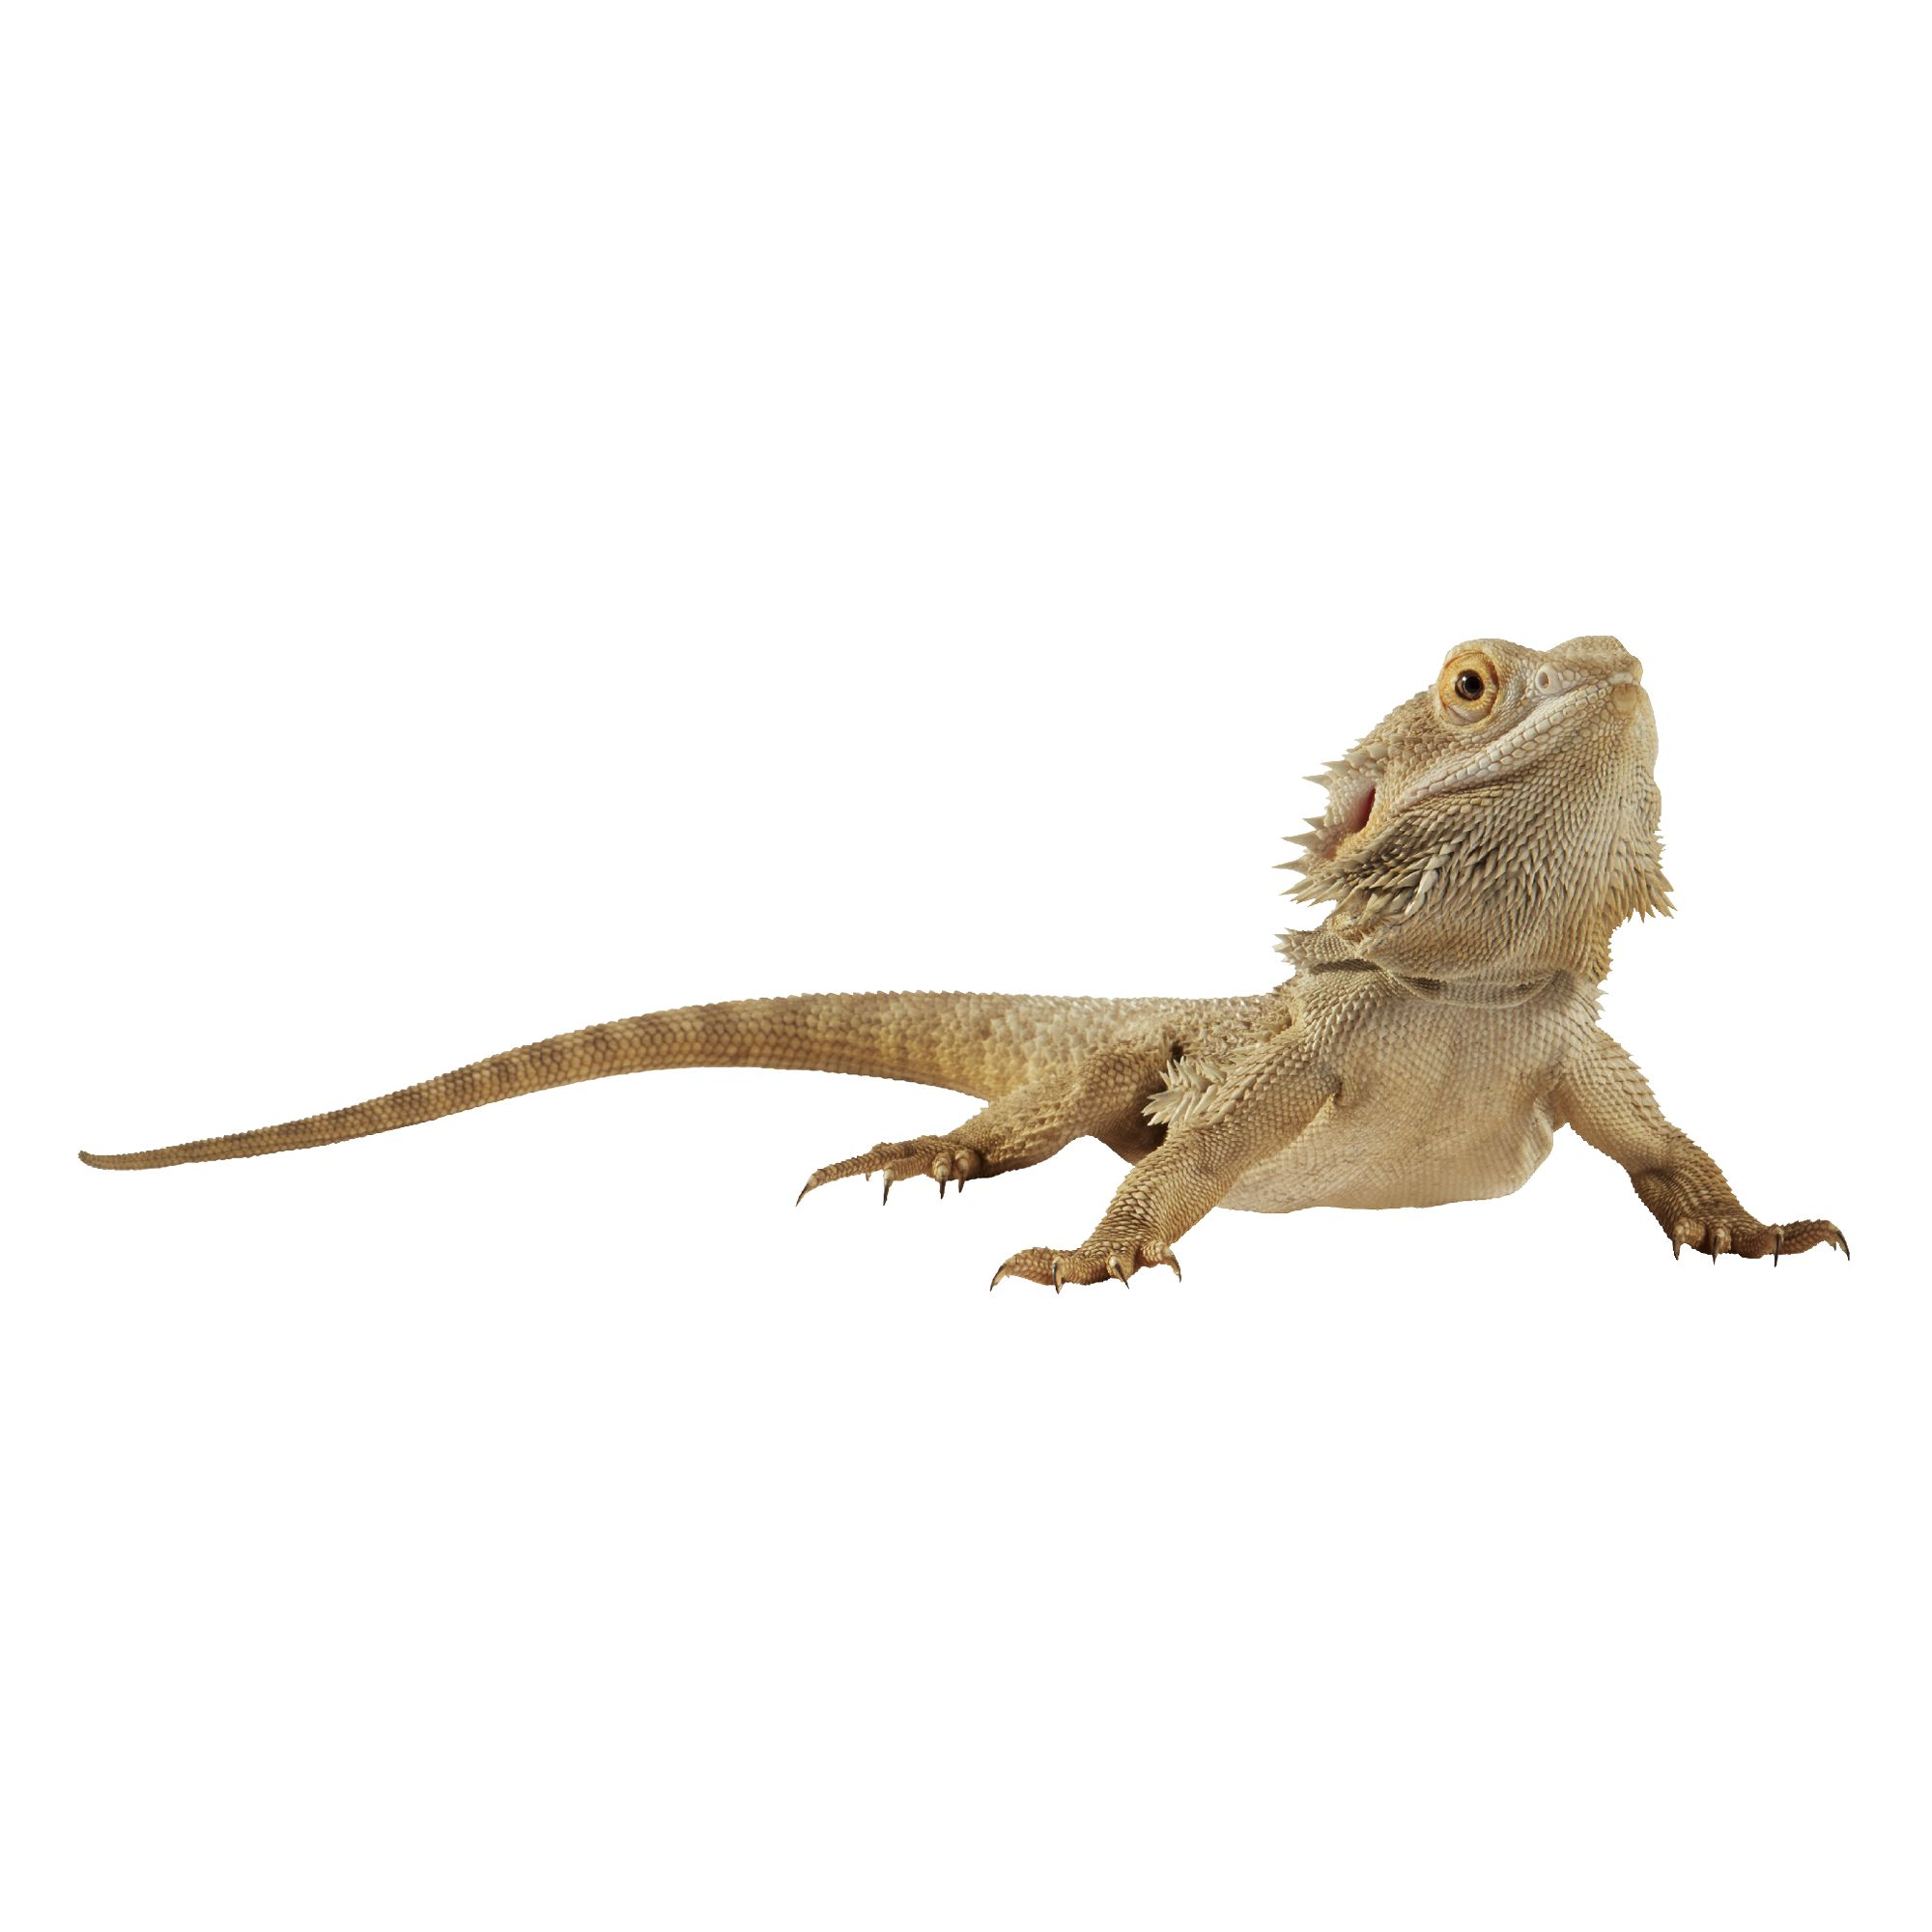 Bearded Dragon For Sale | Live Pet Reptiles | PetSmart